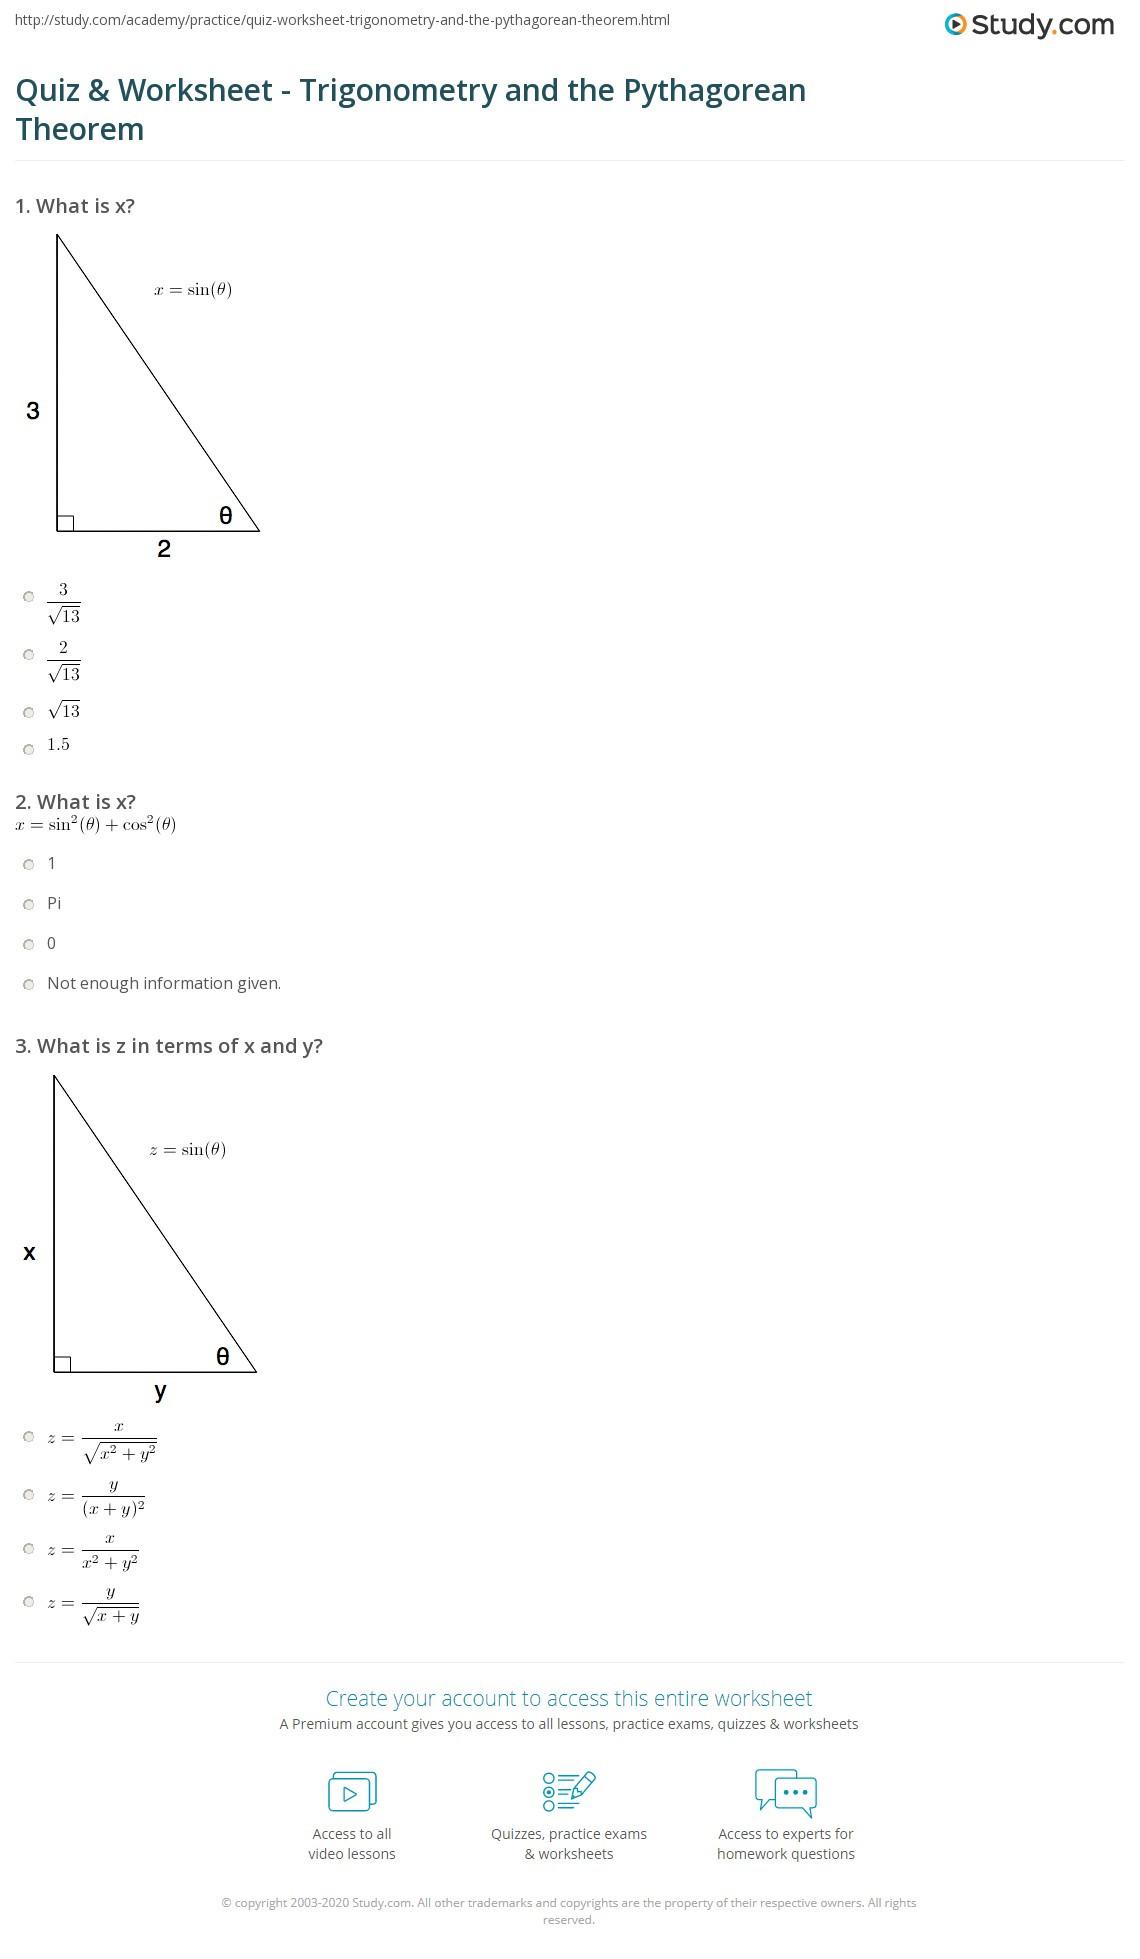 Pythagorean theorem Worksheet Answers Quiz & Worksheet Trigonometry and the Pythagorean theorem